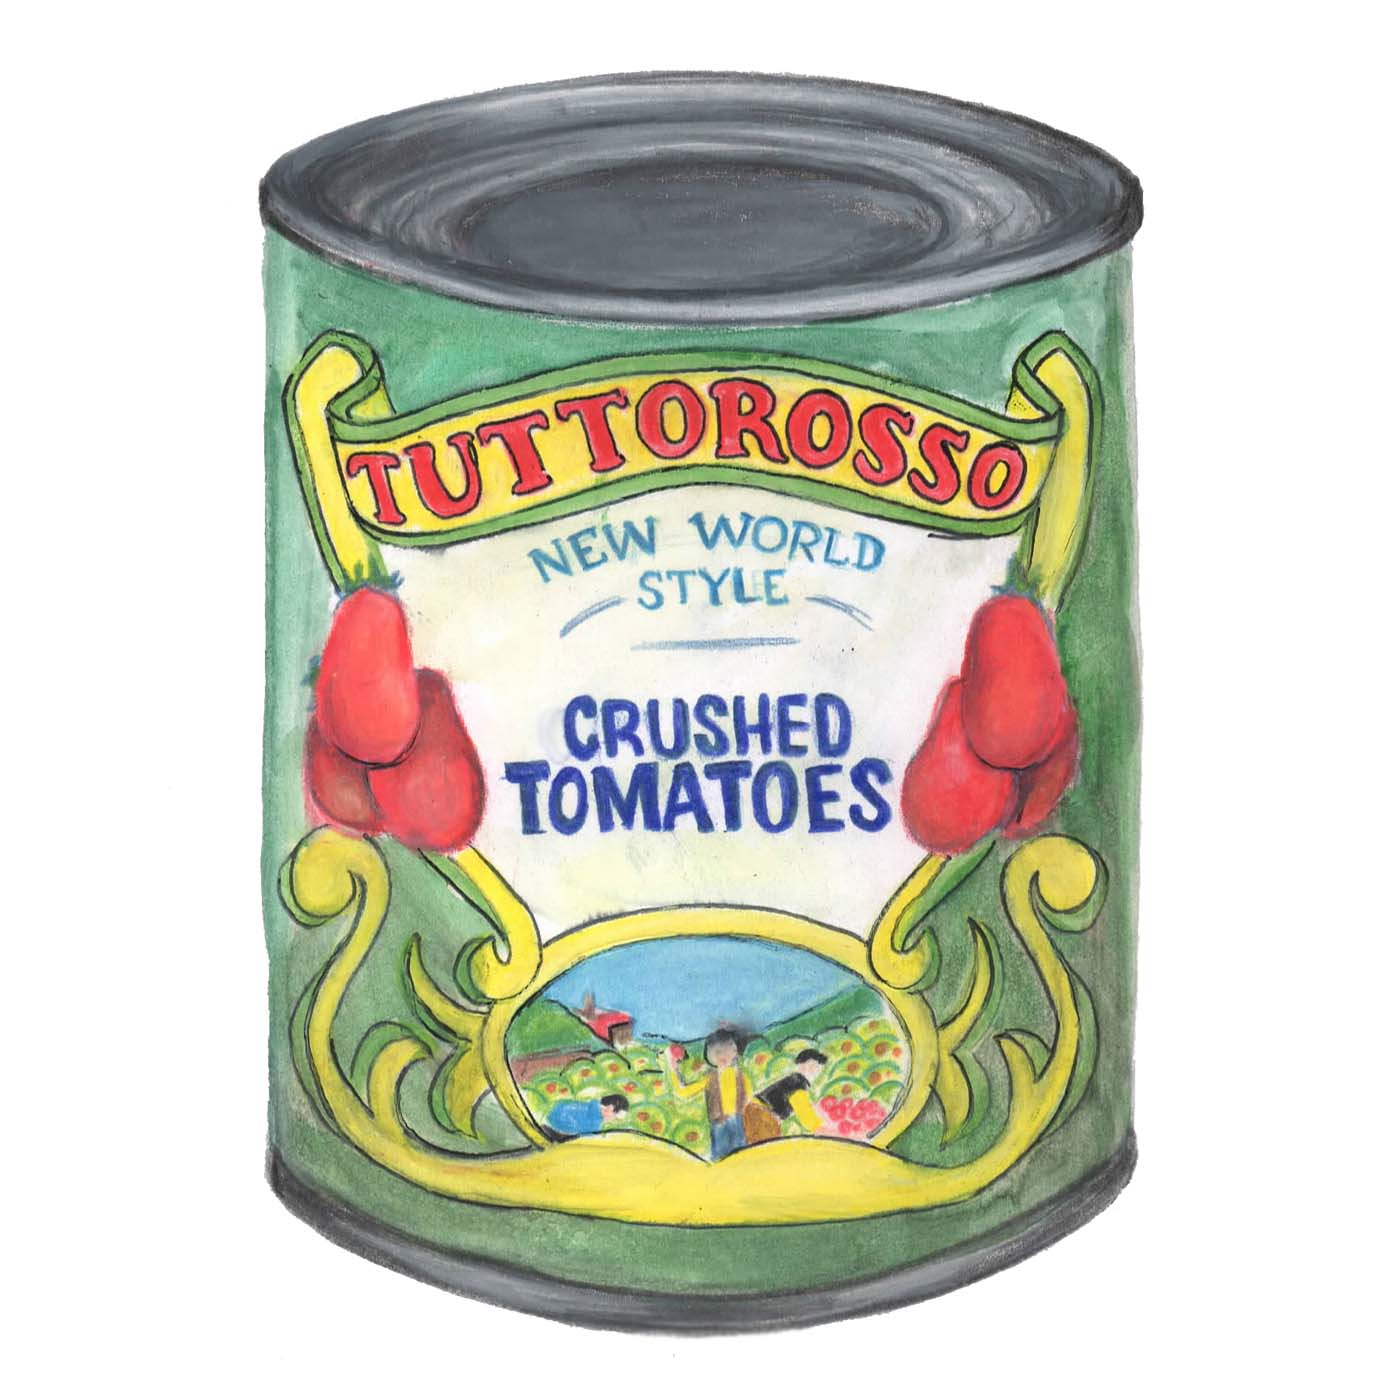 Condimental_Crushed_Tomatoes_Edit.jpg